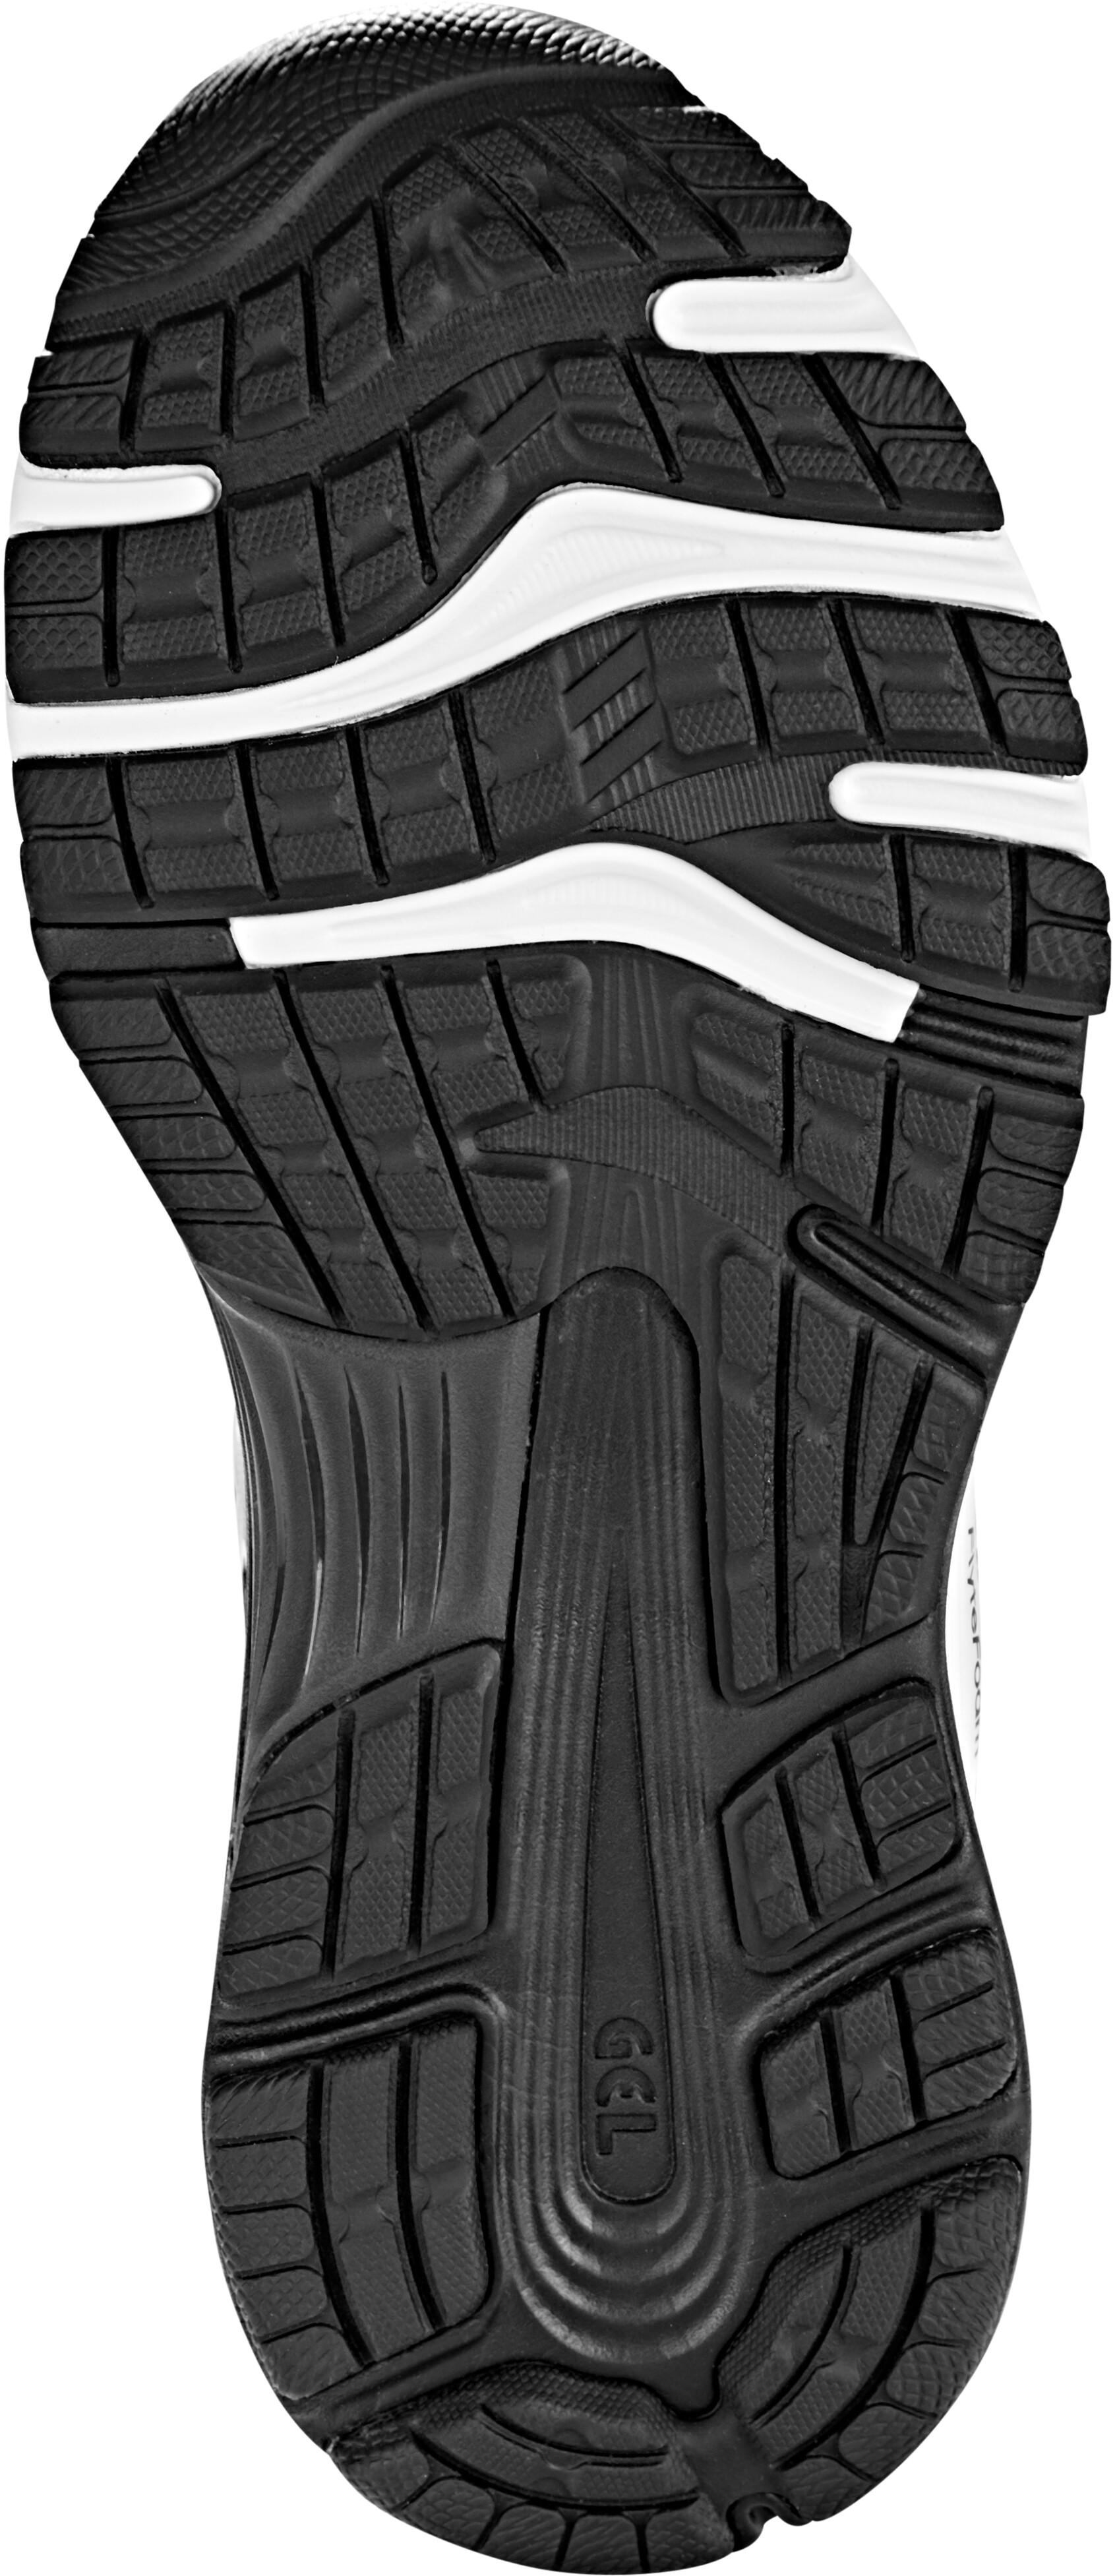 asics Gel-Nimbus 21 scarpe da corsa Donna grigio nero su Bikester 570284769ed